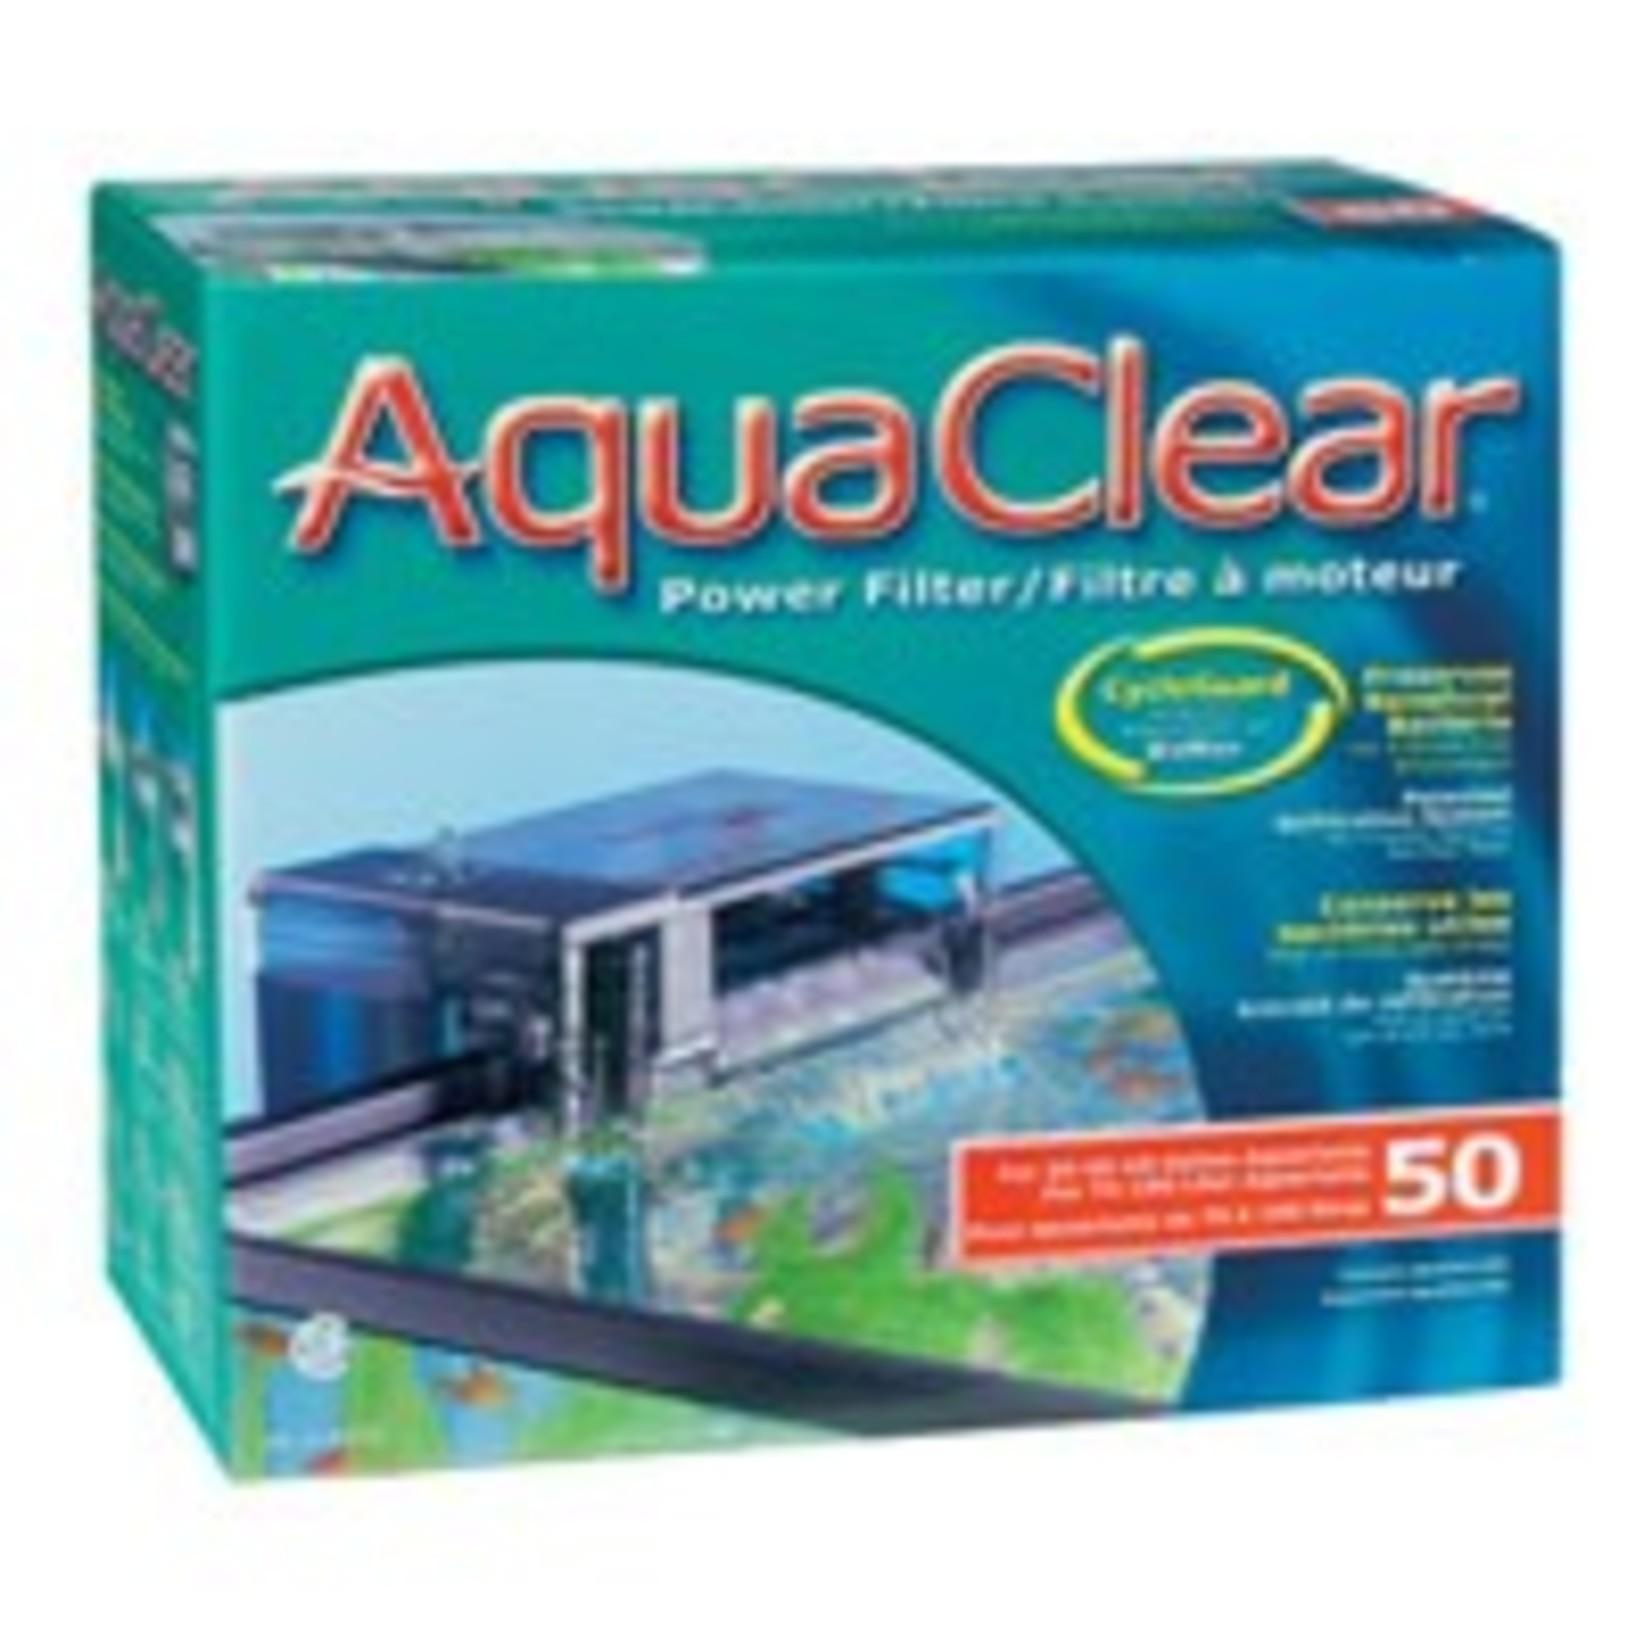 AquaClear 50 Power Filter, 189 L (50 US Gal.)